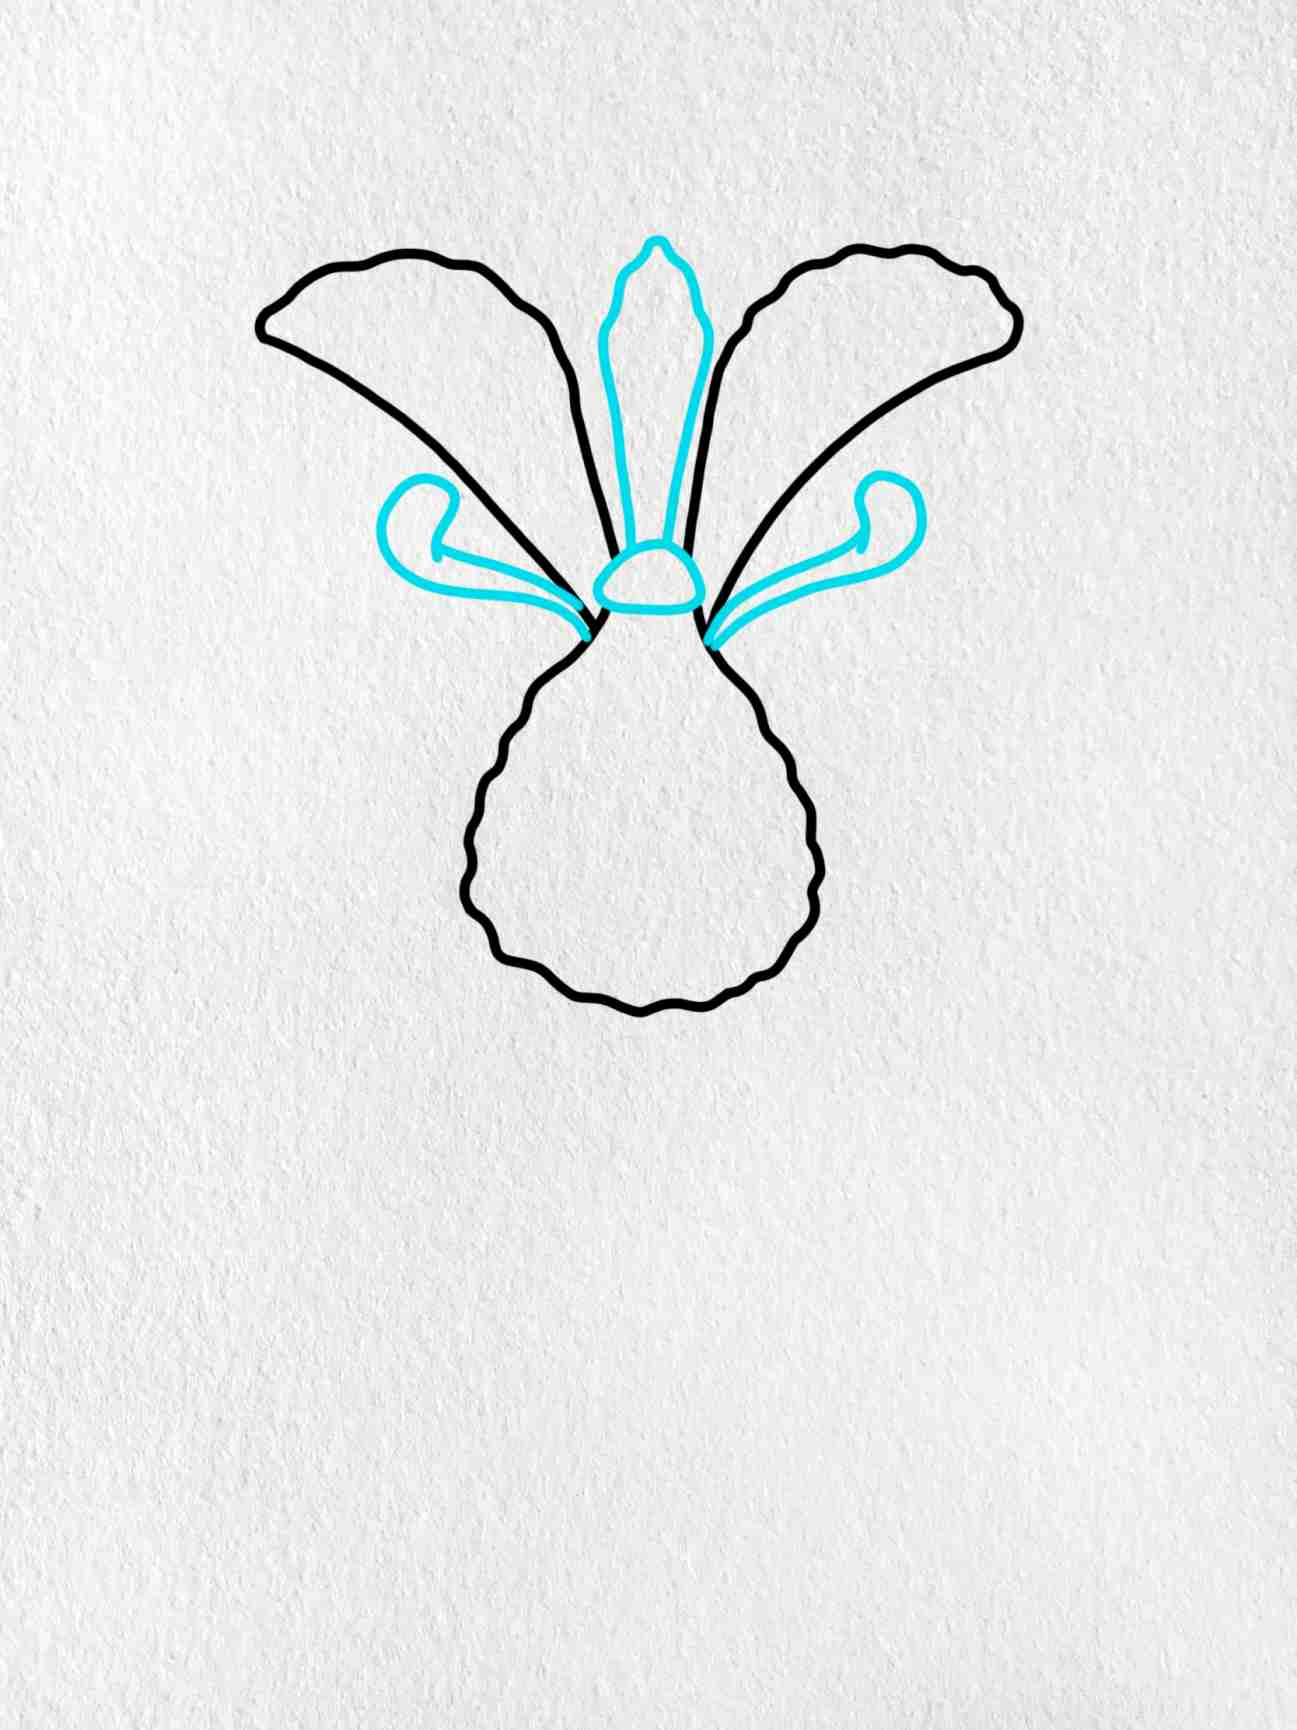 How To Draw An Iris Flower: Step 3